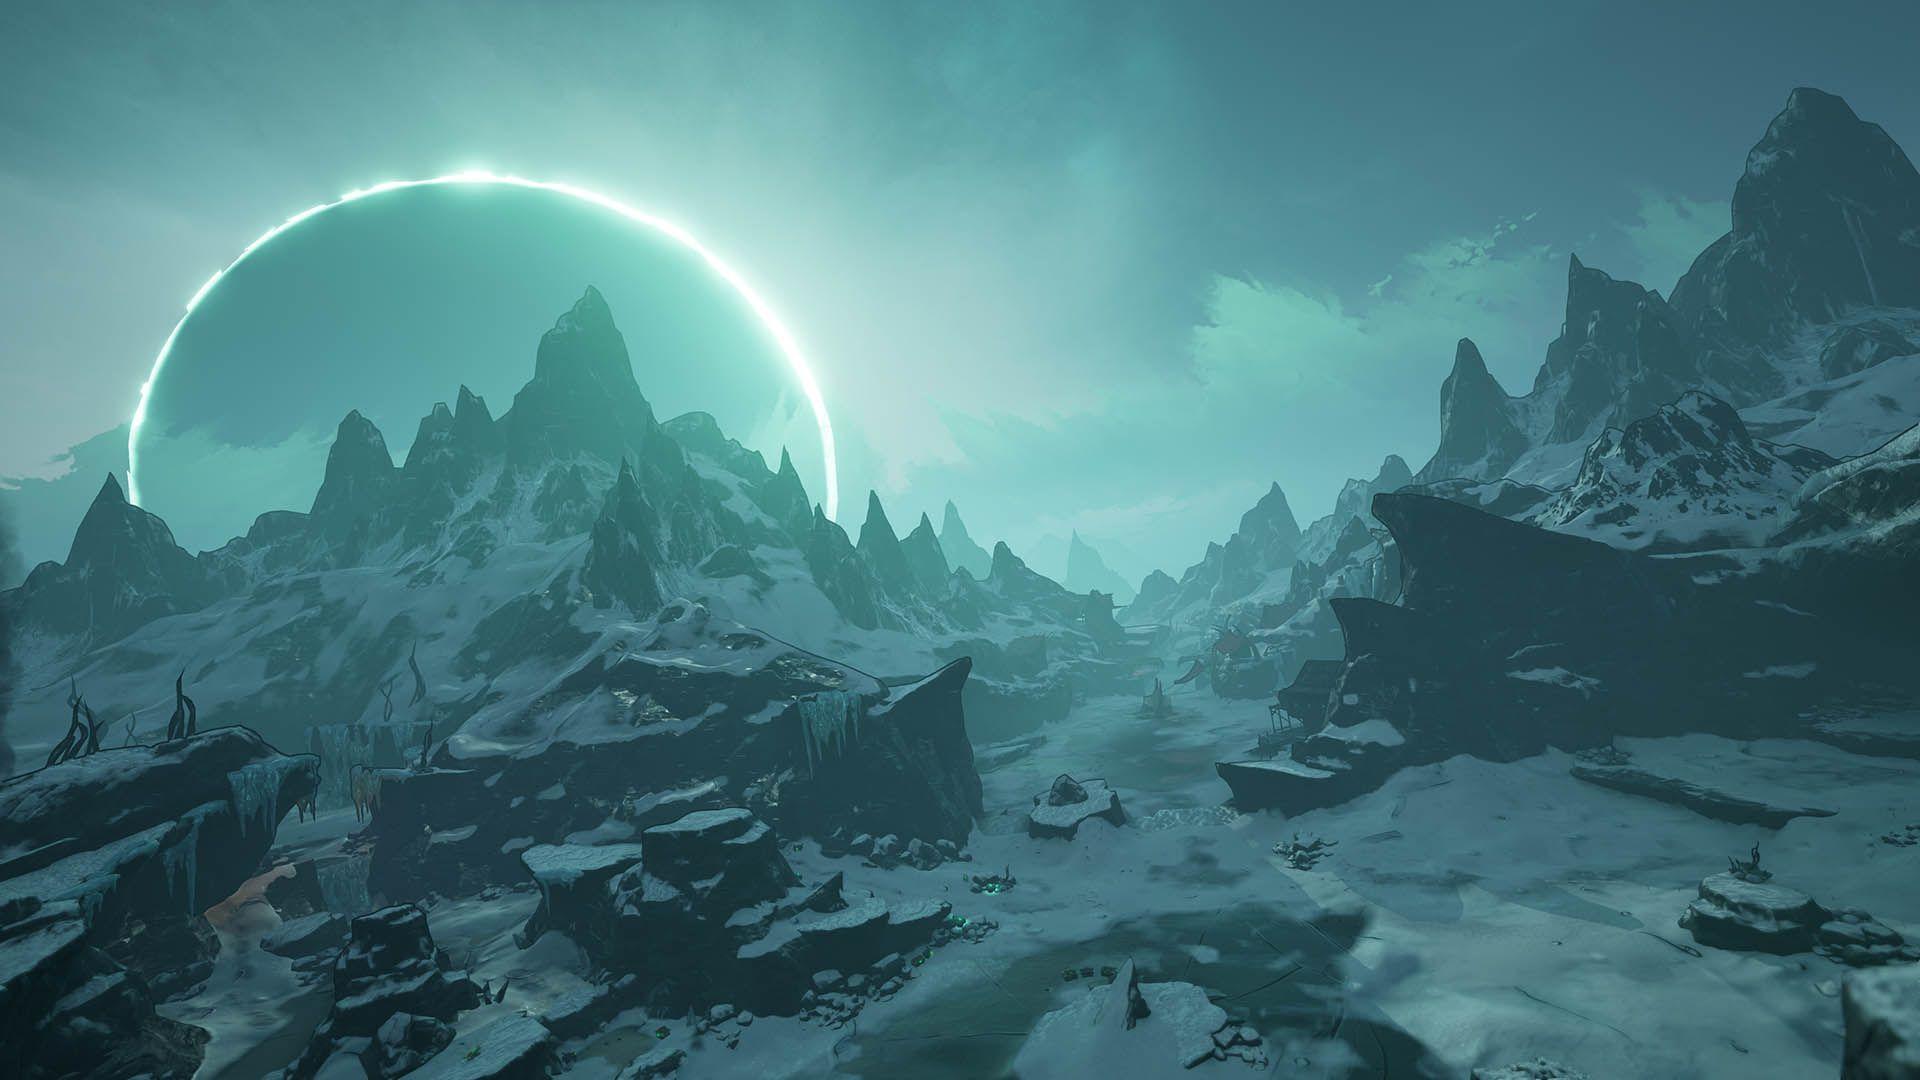 'Borderlands 3' Update 1.10 Adds Guns & Love DLC 2 Plus Cap Increase - Patch Notes